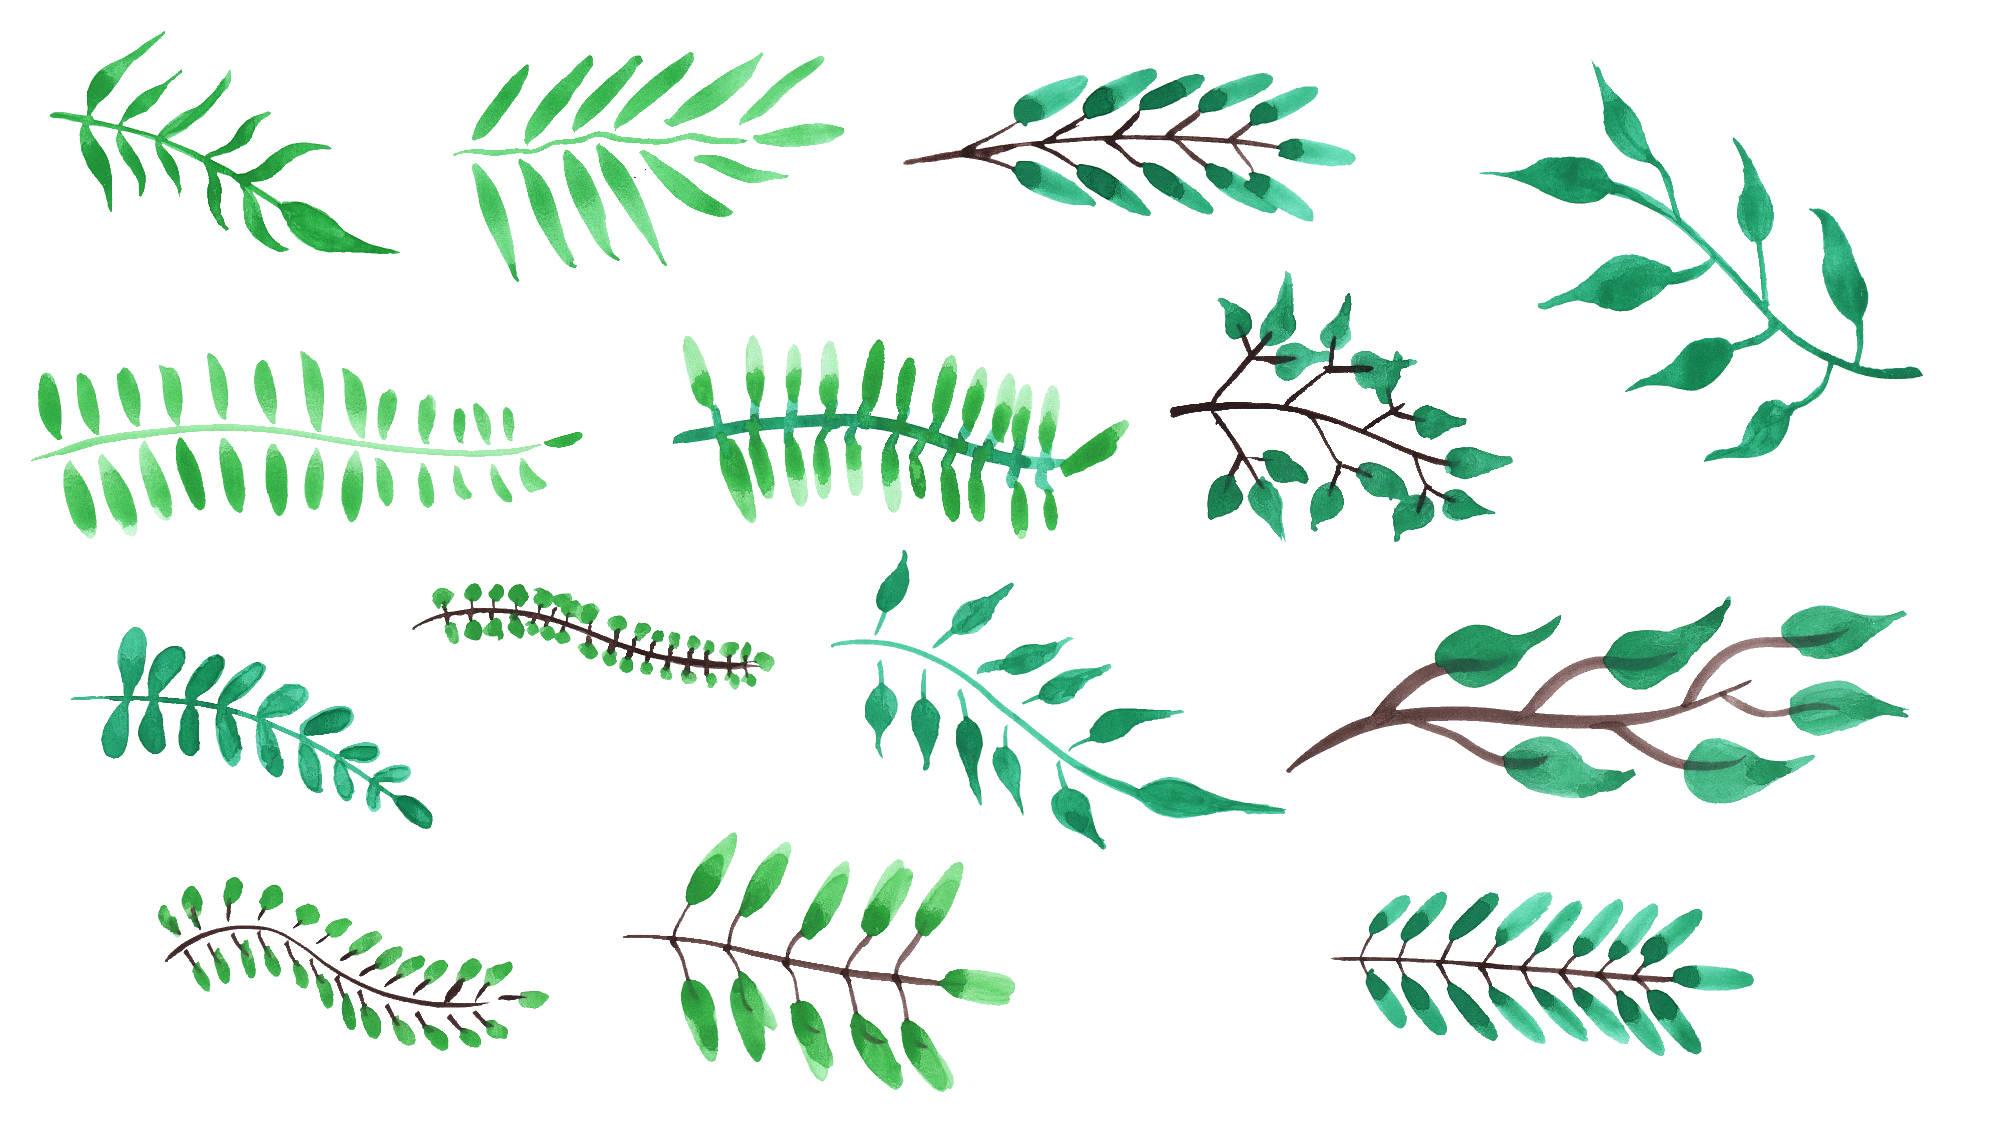 14 Watercolor Leaf PNG Transparent Vol 5